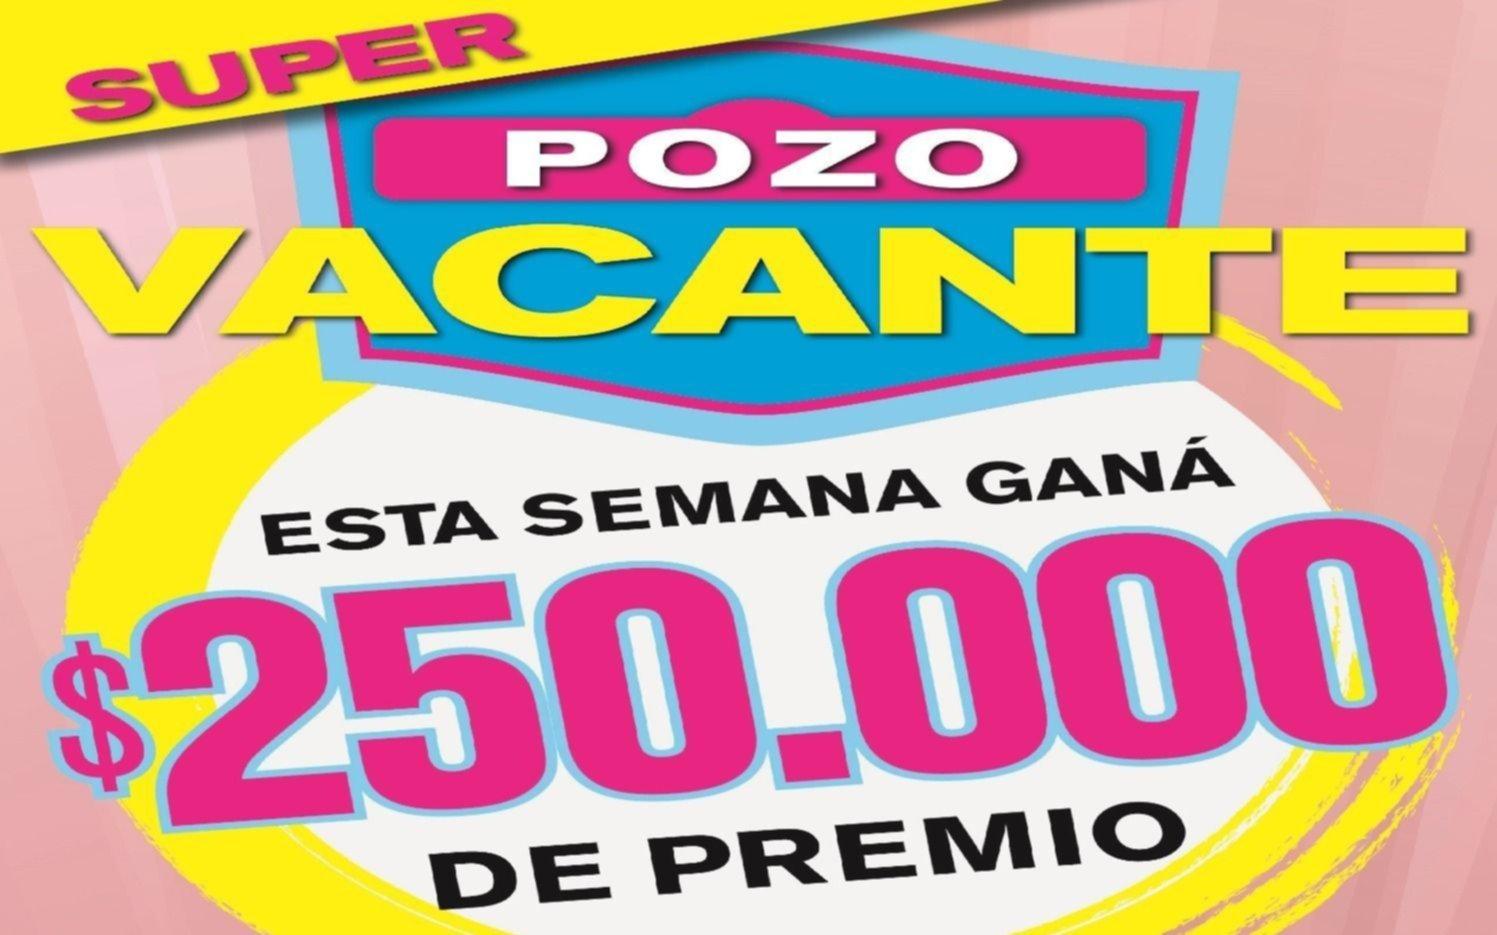 ¡Controlá el Cartonazo, un cuarto de millón de pesos puede ser tuyo esta semana!